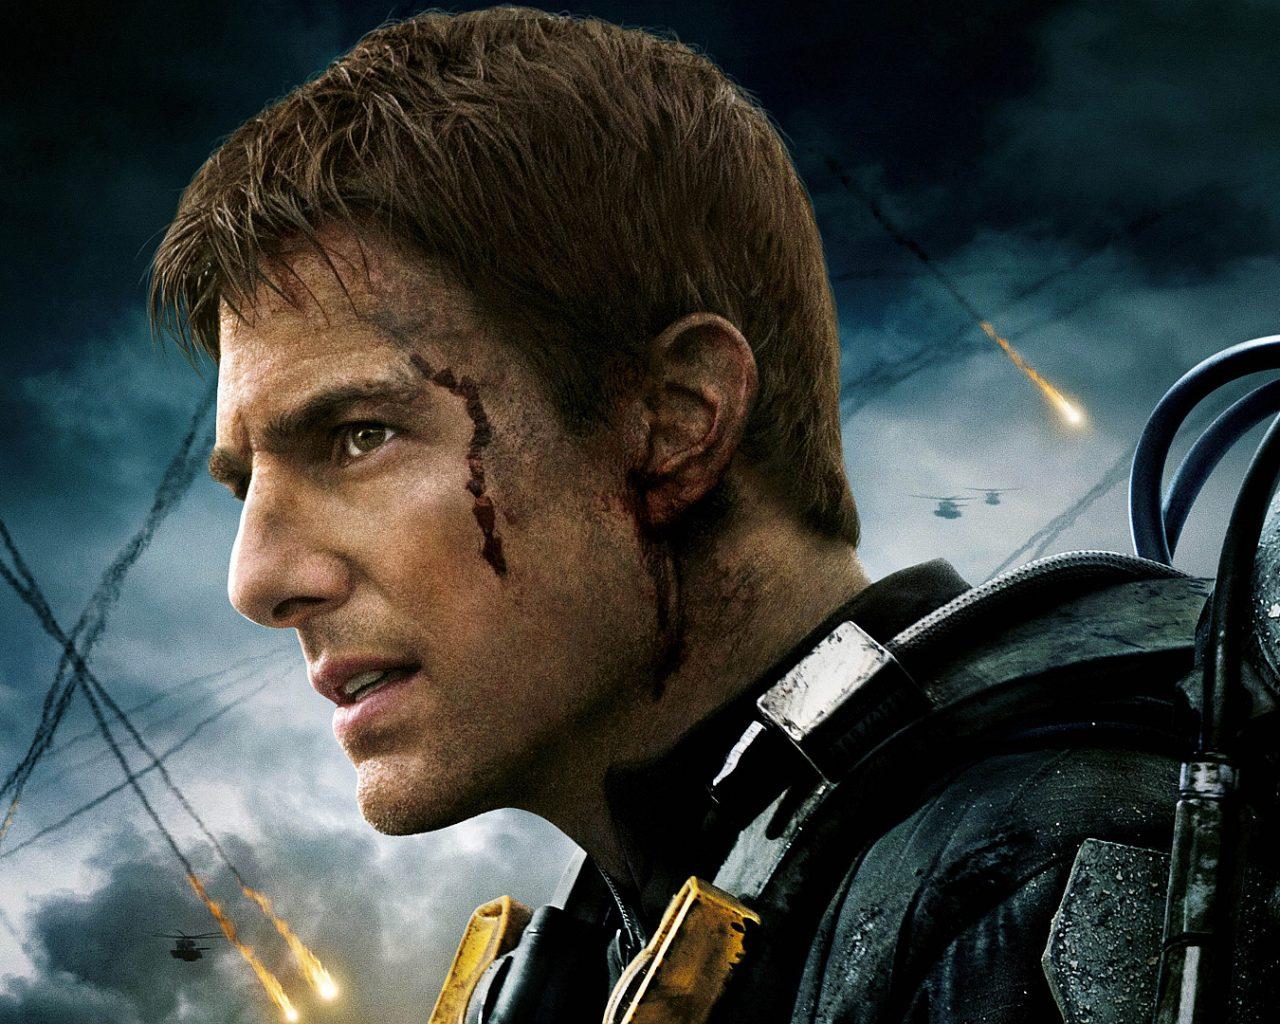 Edge of Tomorrow, Major William Cage, Tom Cruise HD Wallpaper